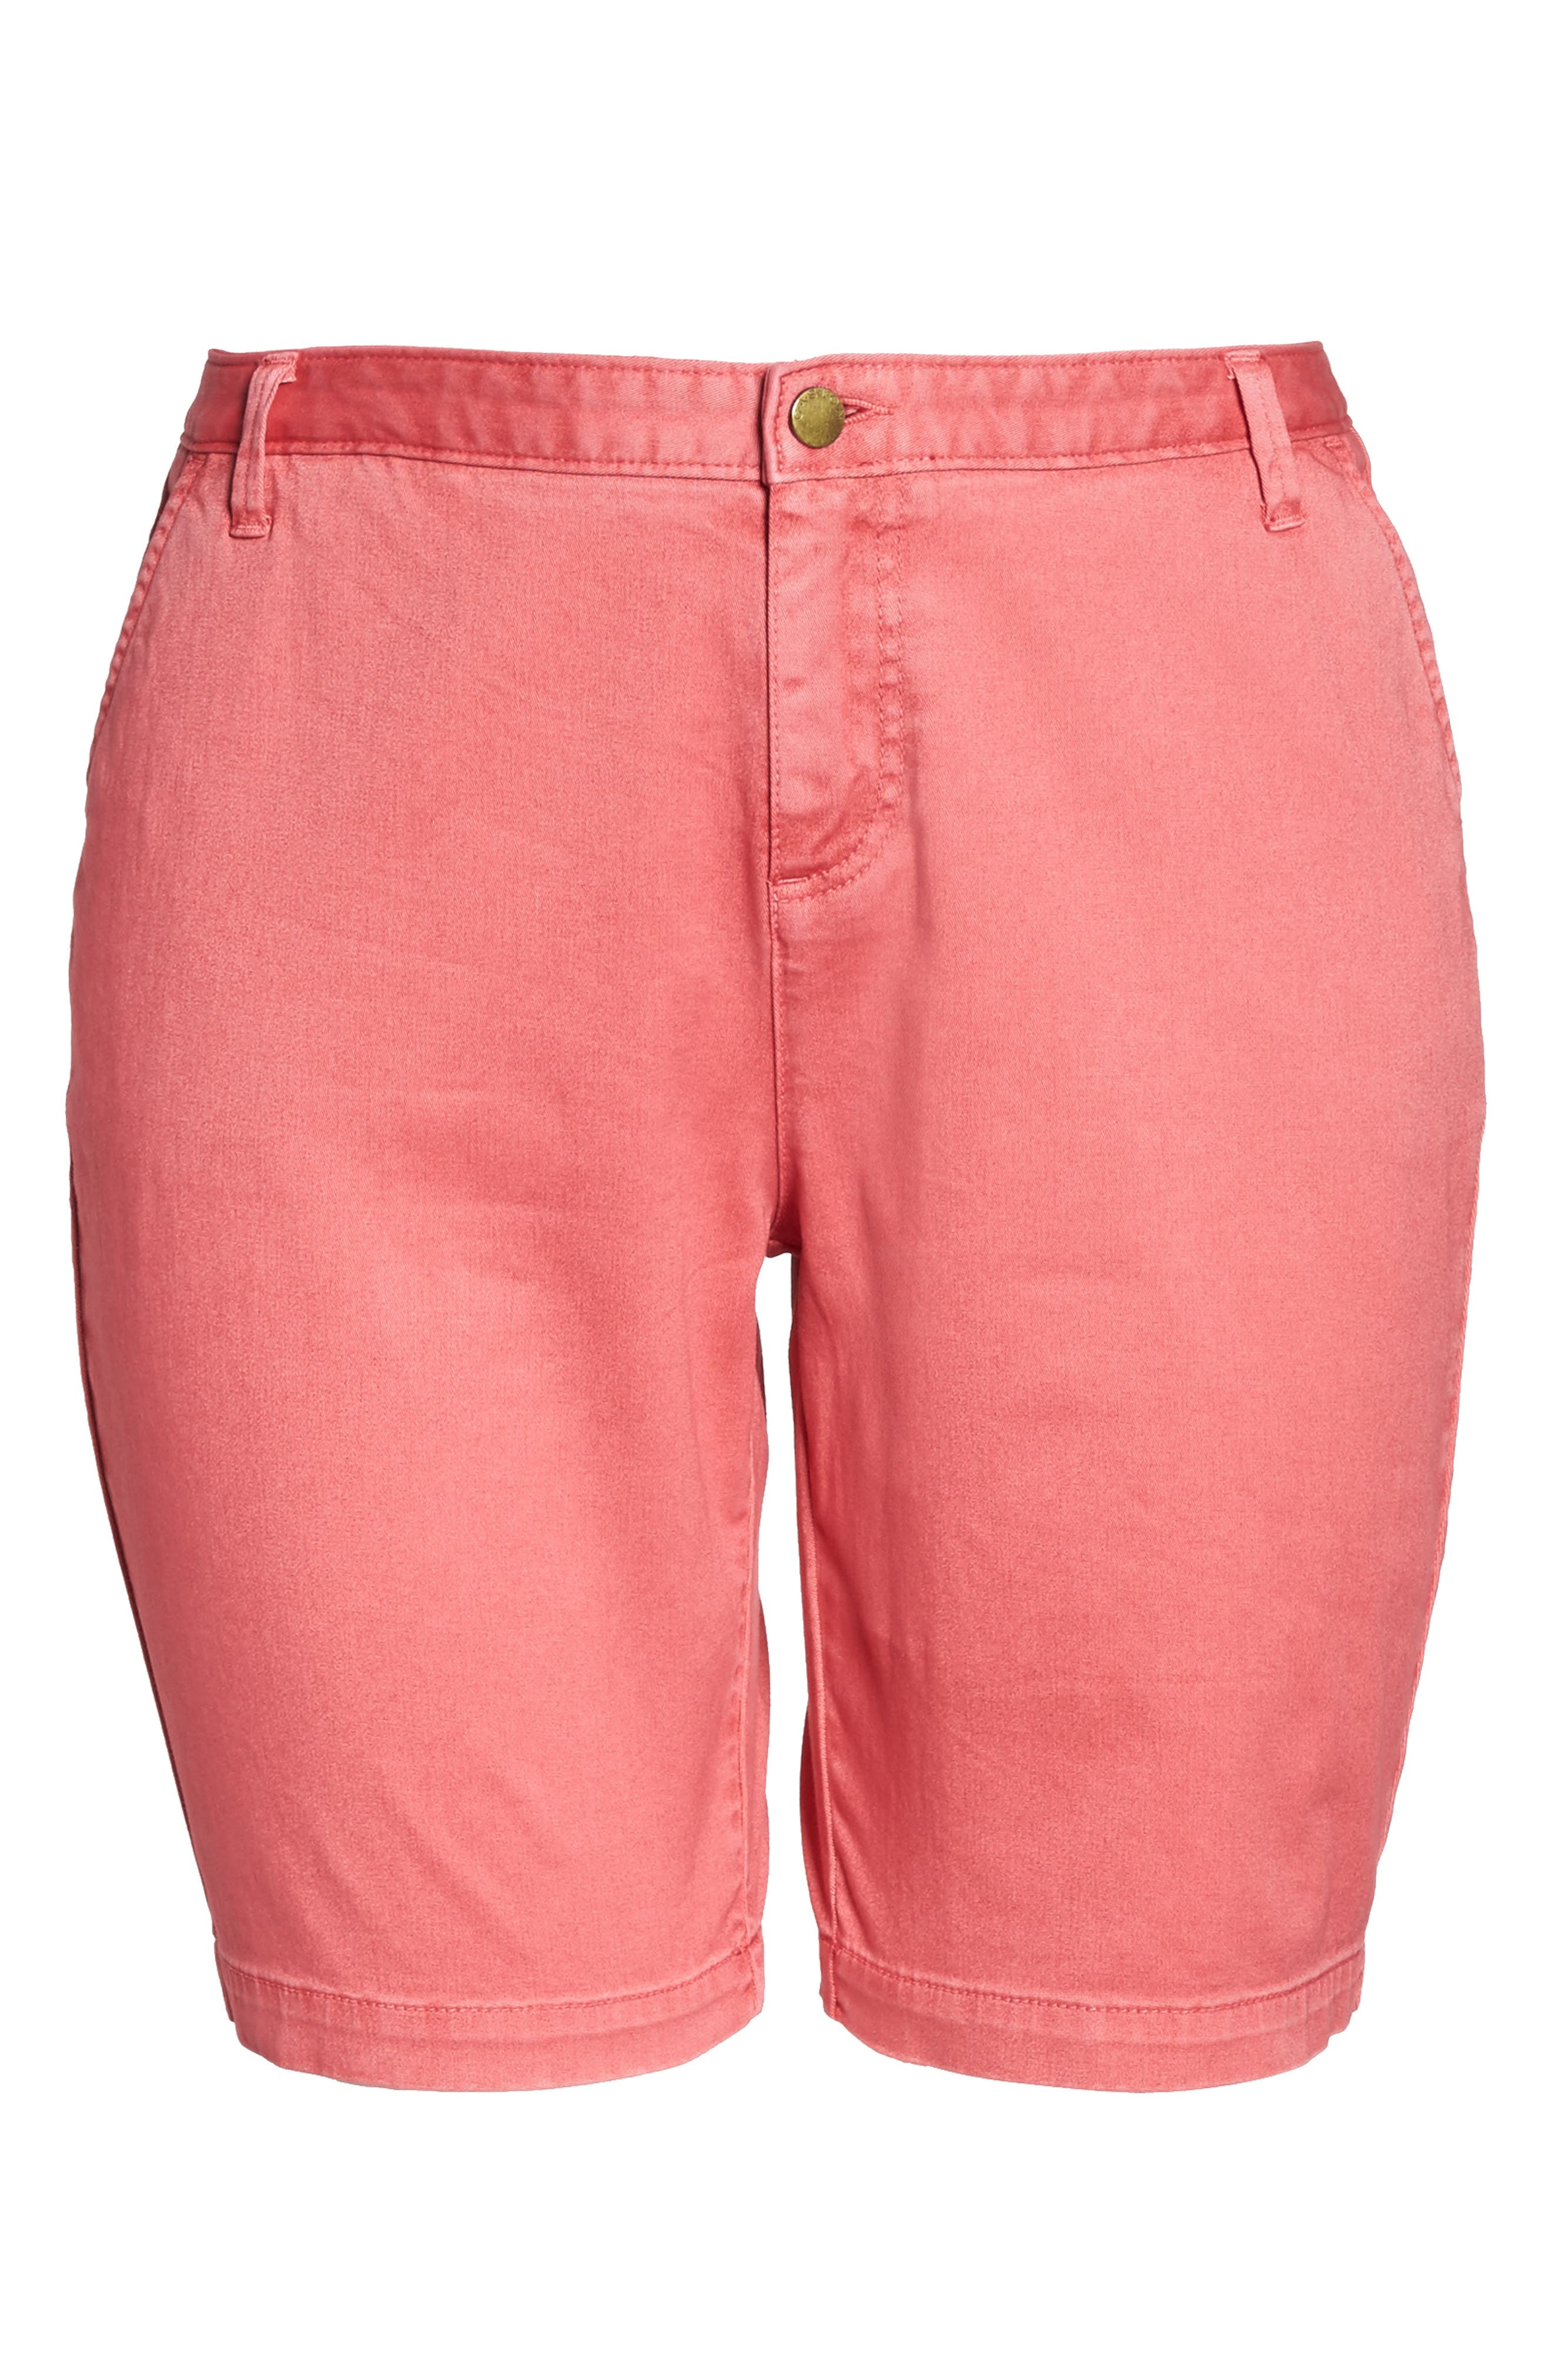 Twill Shorts,                             Alternate thumbnail 25, color,